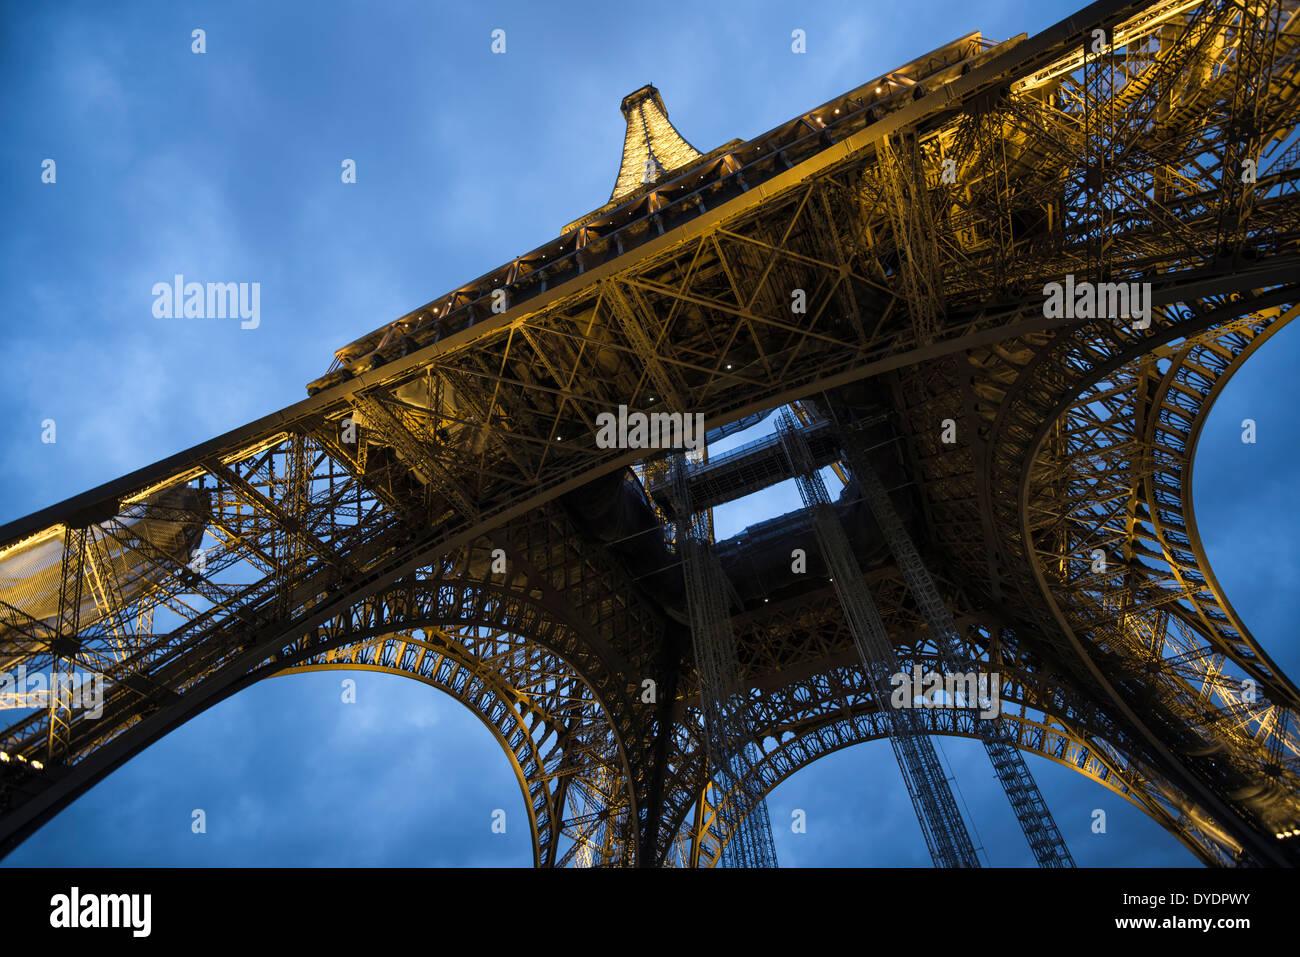 Under the Eiffel Tower, Paris - Stock Image